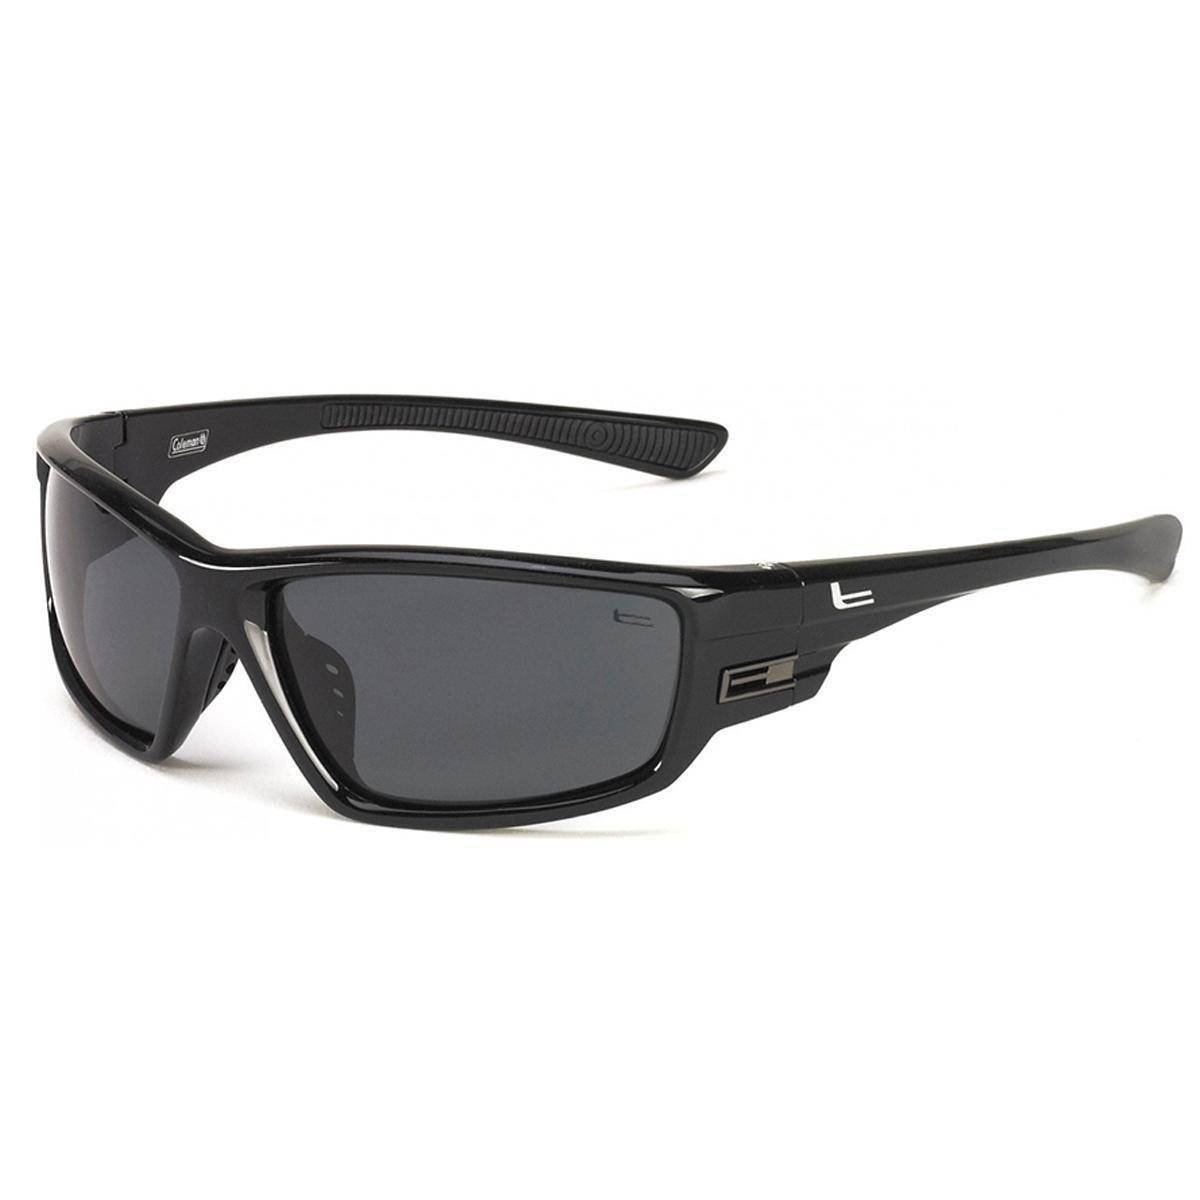 Óculos de Sol Coleman C6028C3 Lentes Polarizadas 100% UVA-UVB ... 0440c4211b